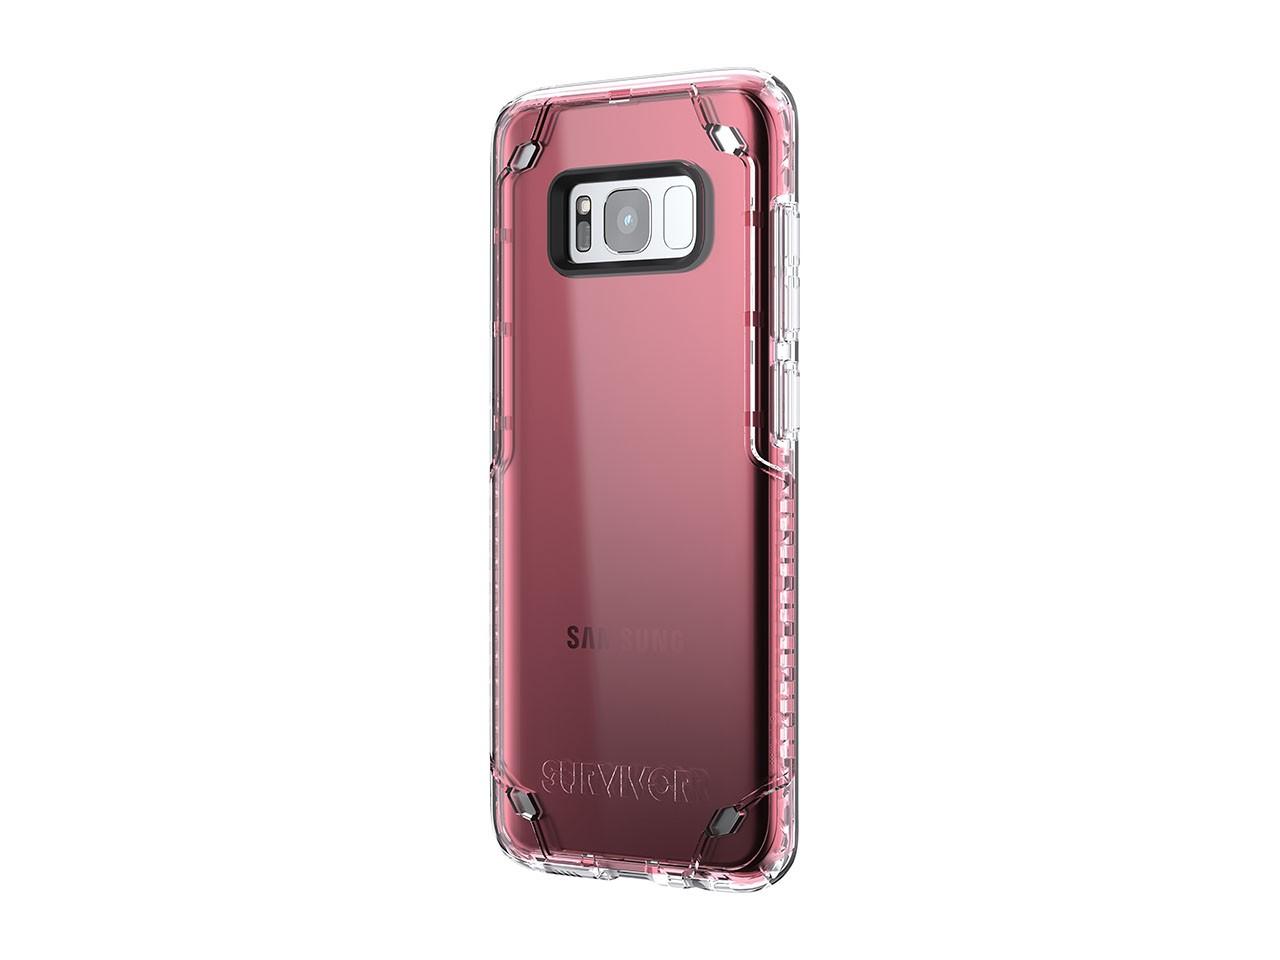 survivor-strong-samsung-galaxy-s8-plus-pink-tint-back-angled.jpg